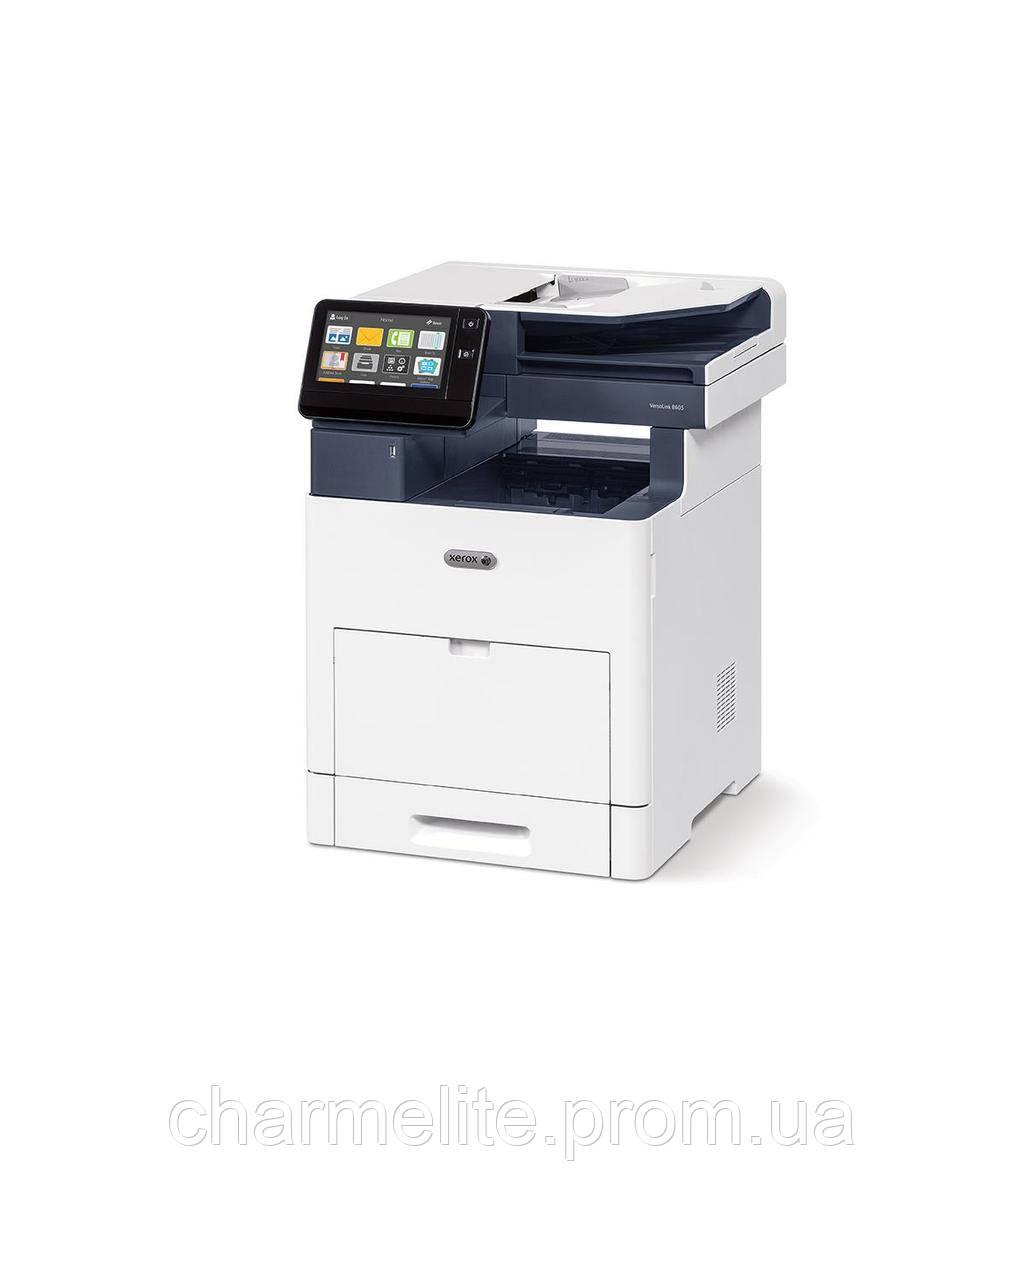 МФУ А4 ч/б Xerox VersaLink B605S